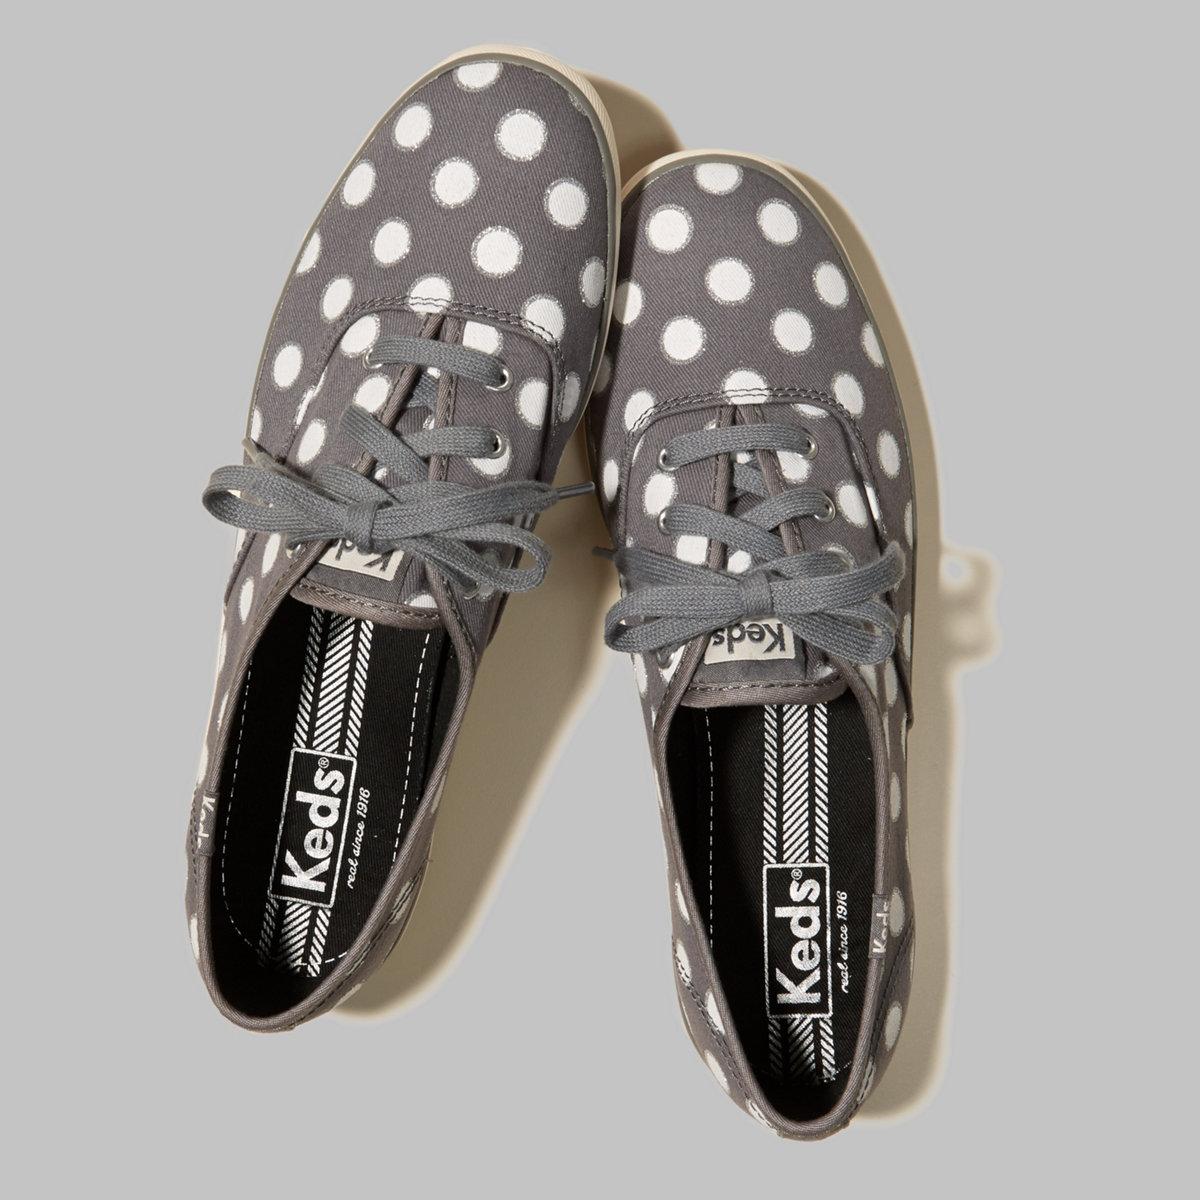 Keds Champion Shine Dot Sneakers